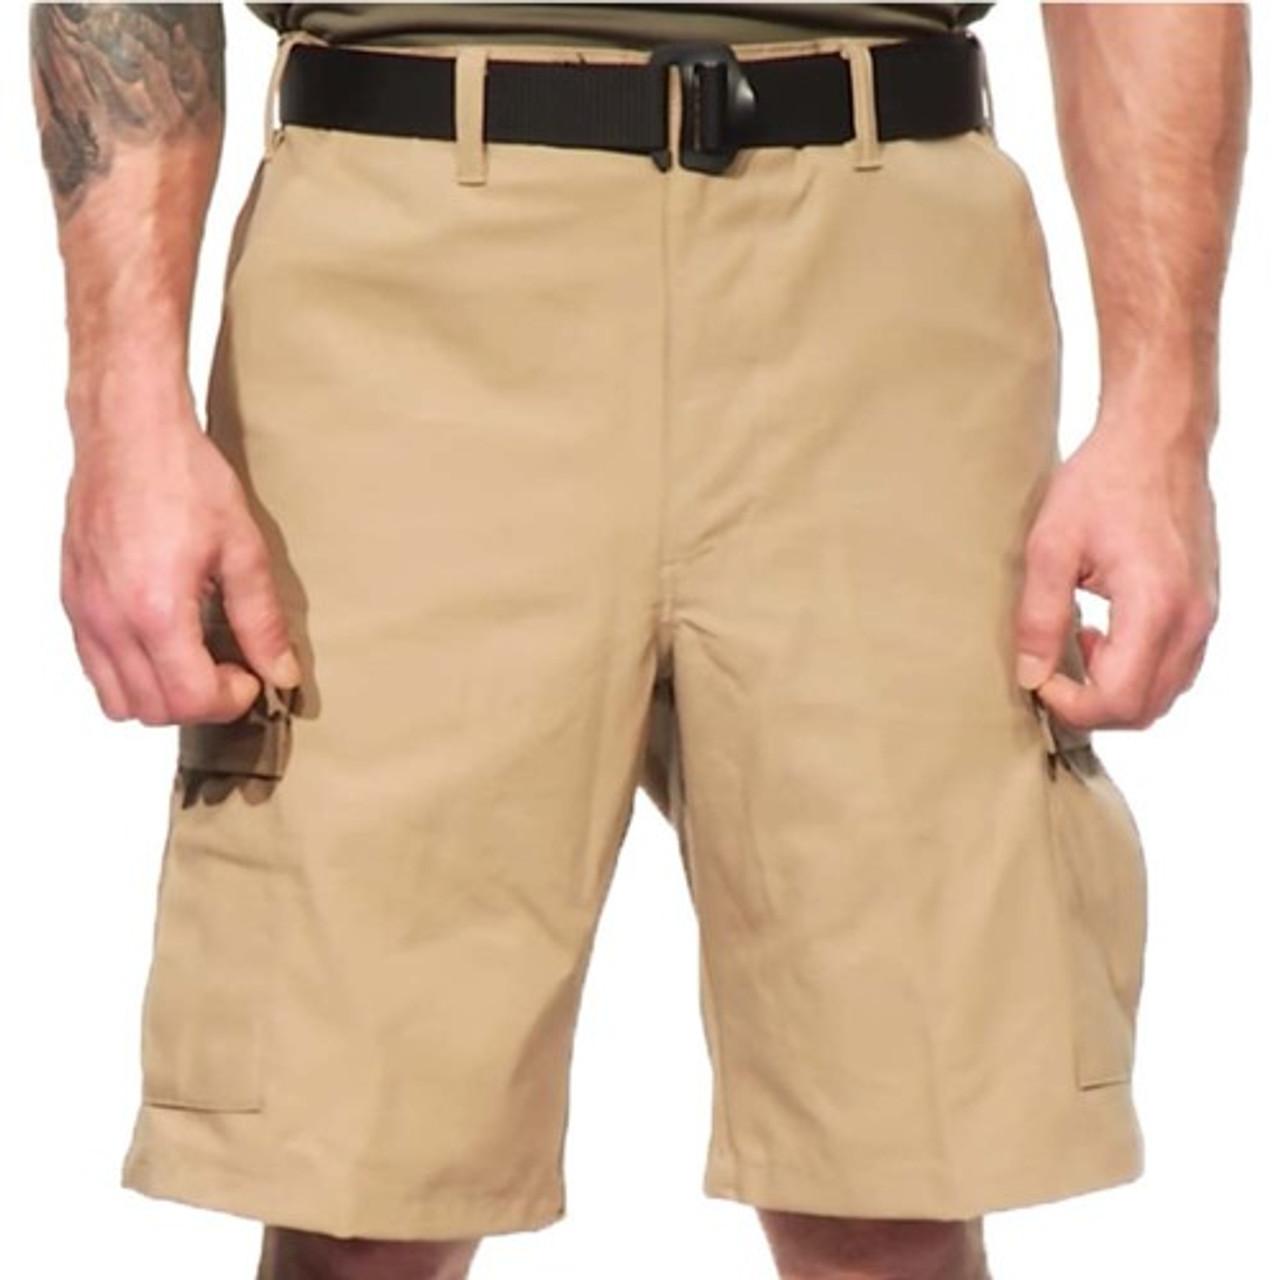 Zipper Fly Men/'s 24-7 Tactical Uniform Cargo Shorts by TRU-SPEC FREE SHIPPING